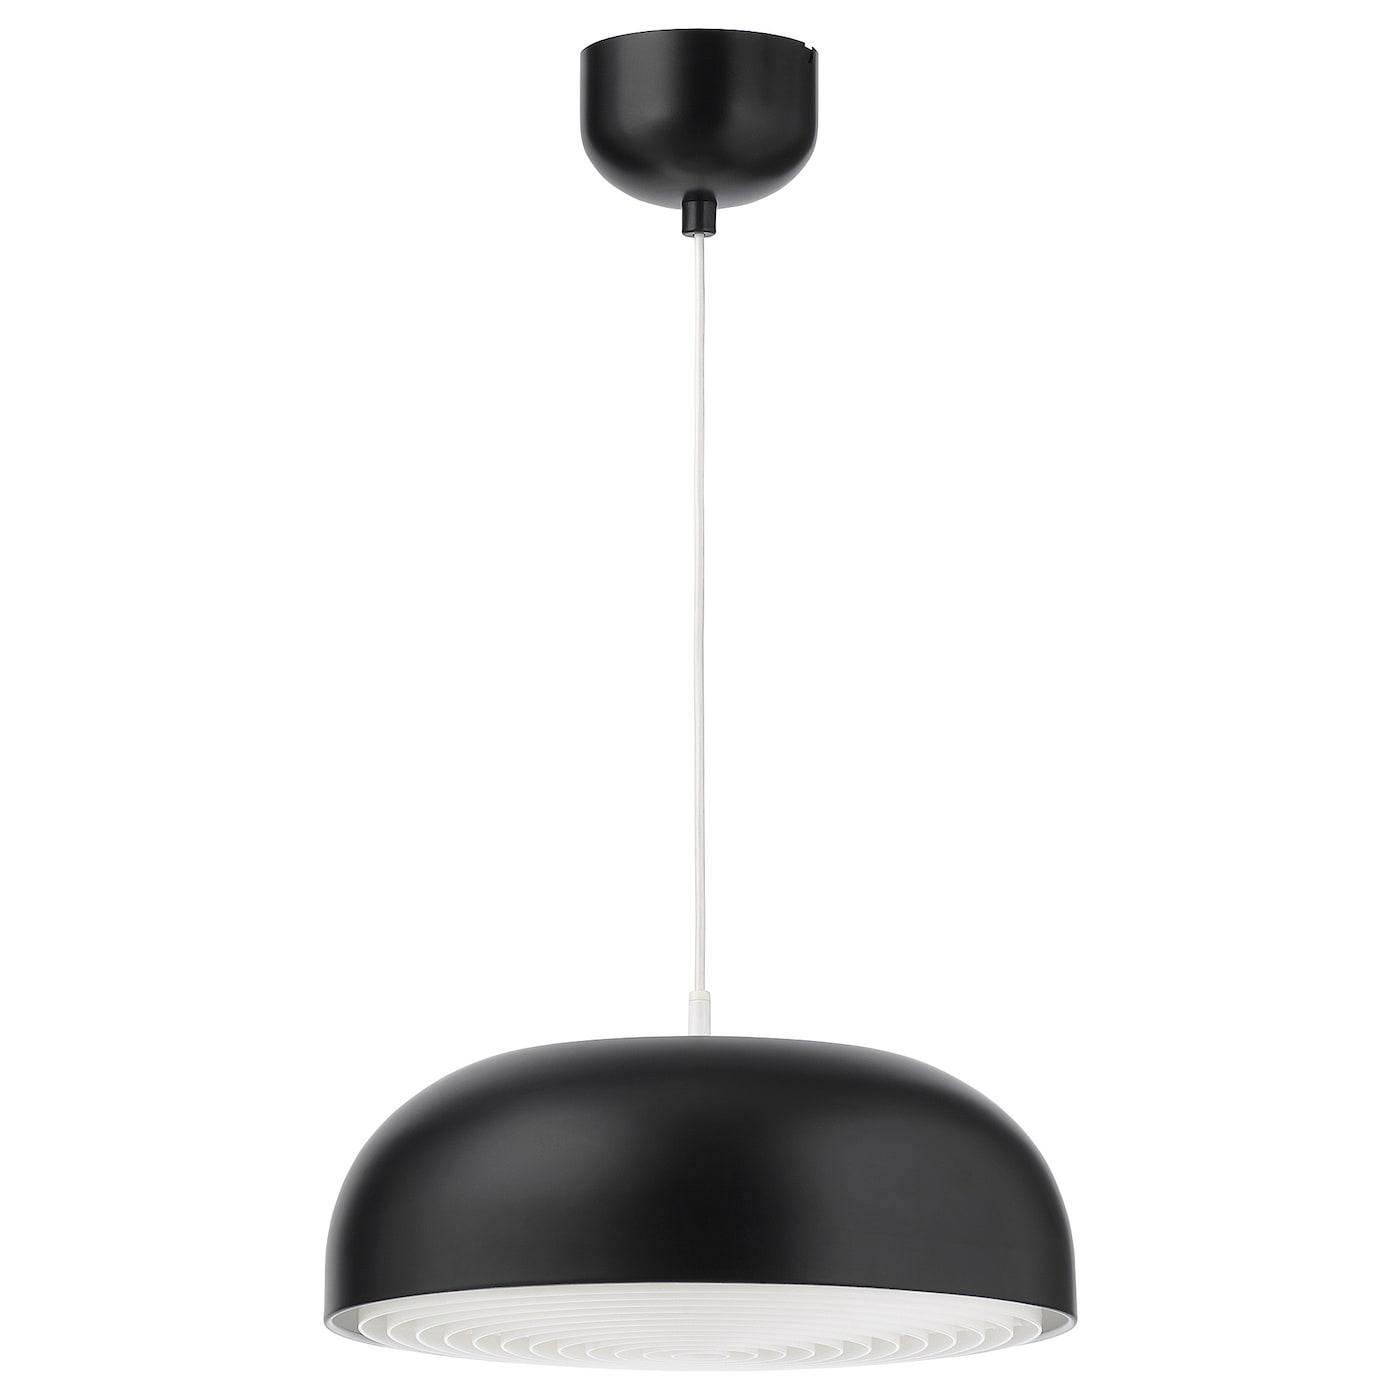 nym ne hanglamp zwart ikea. Black Bedroom Furniture Sets. Home Design Ideas